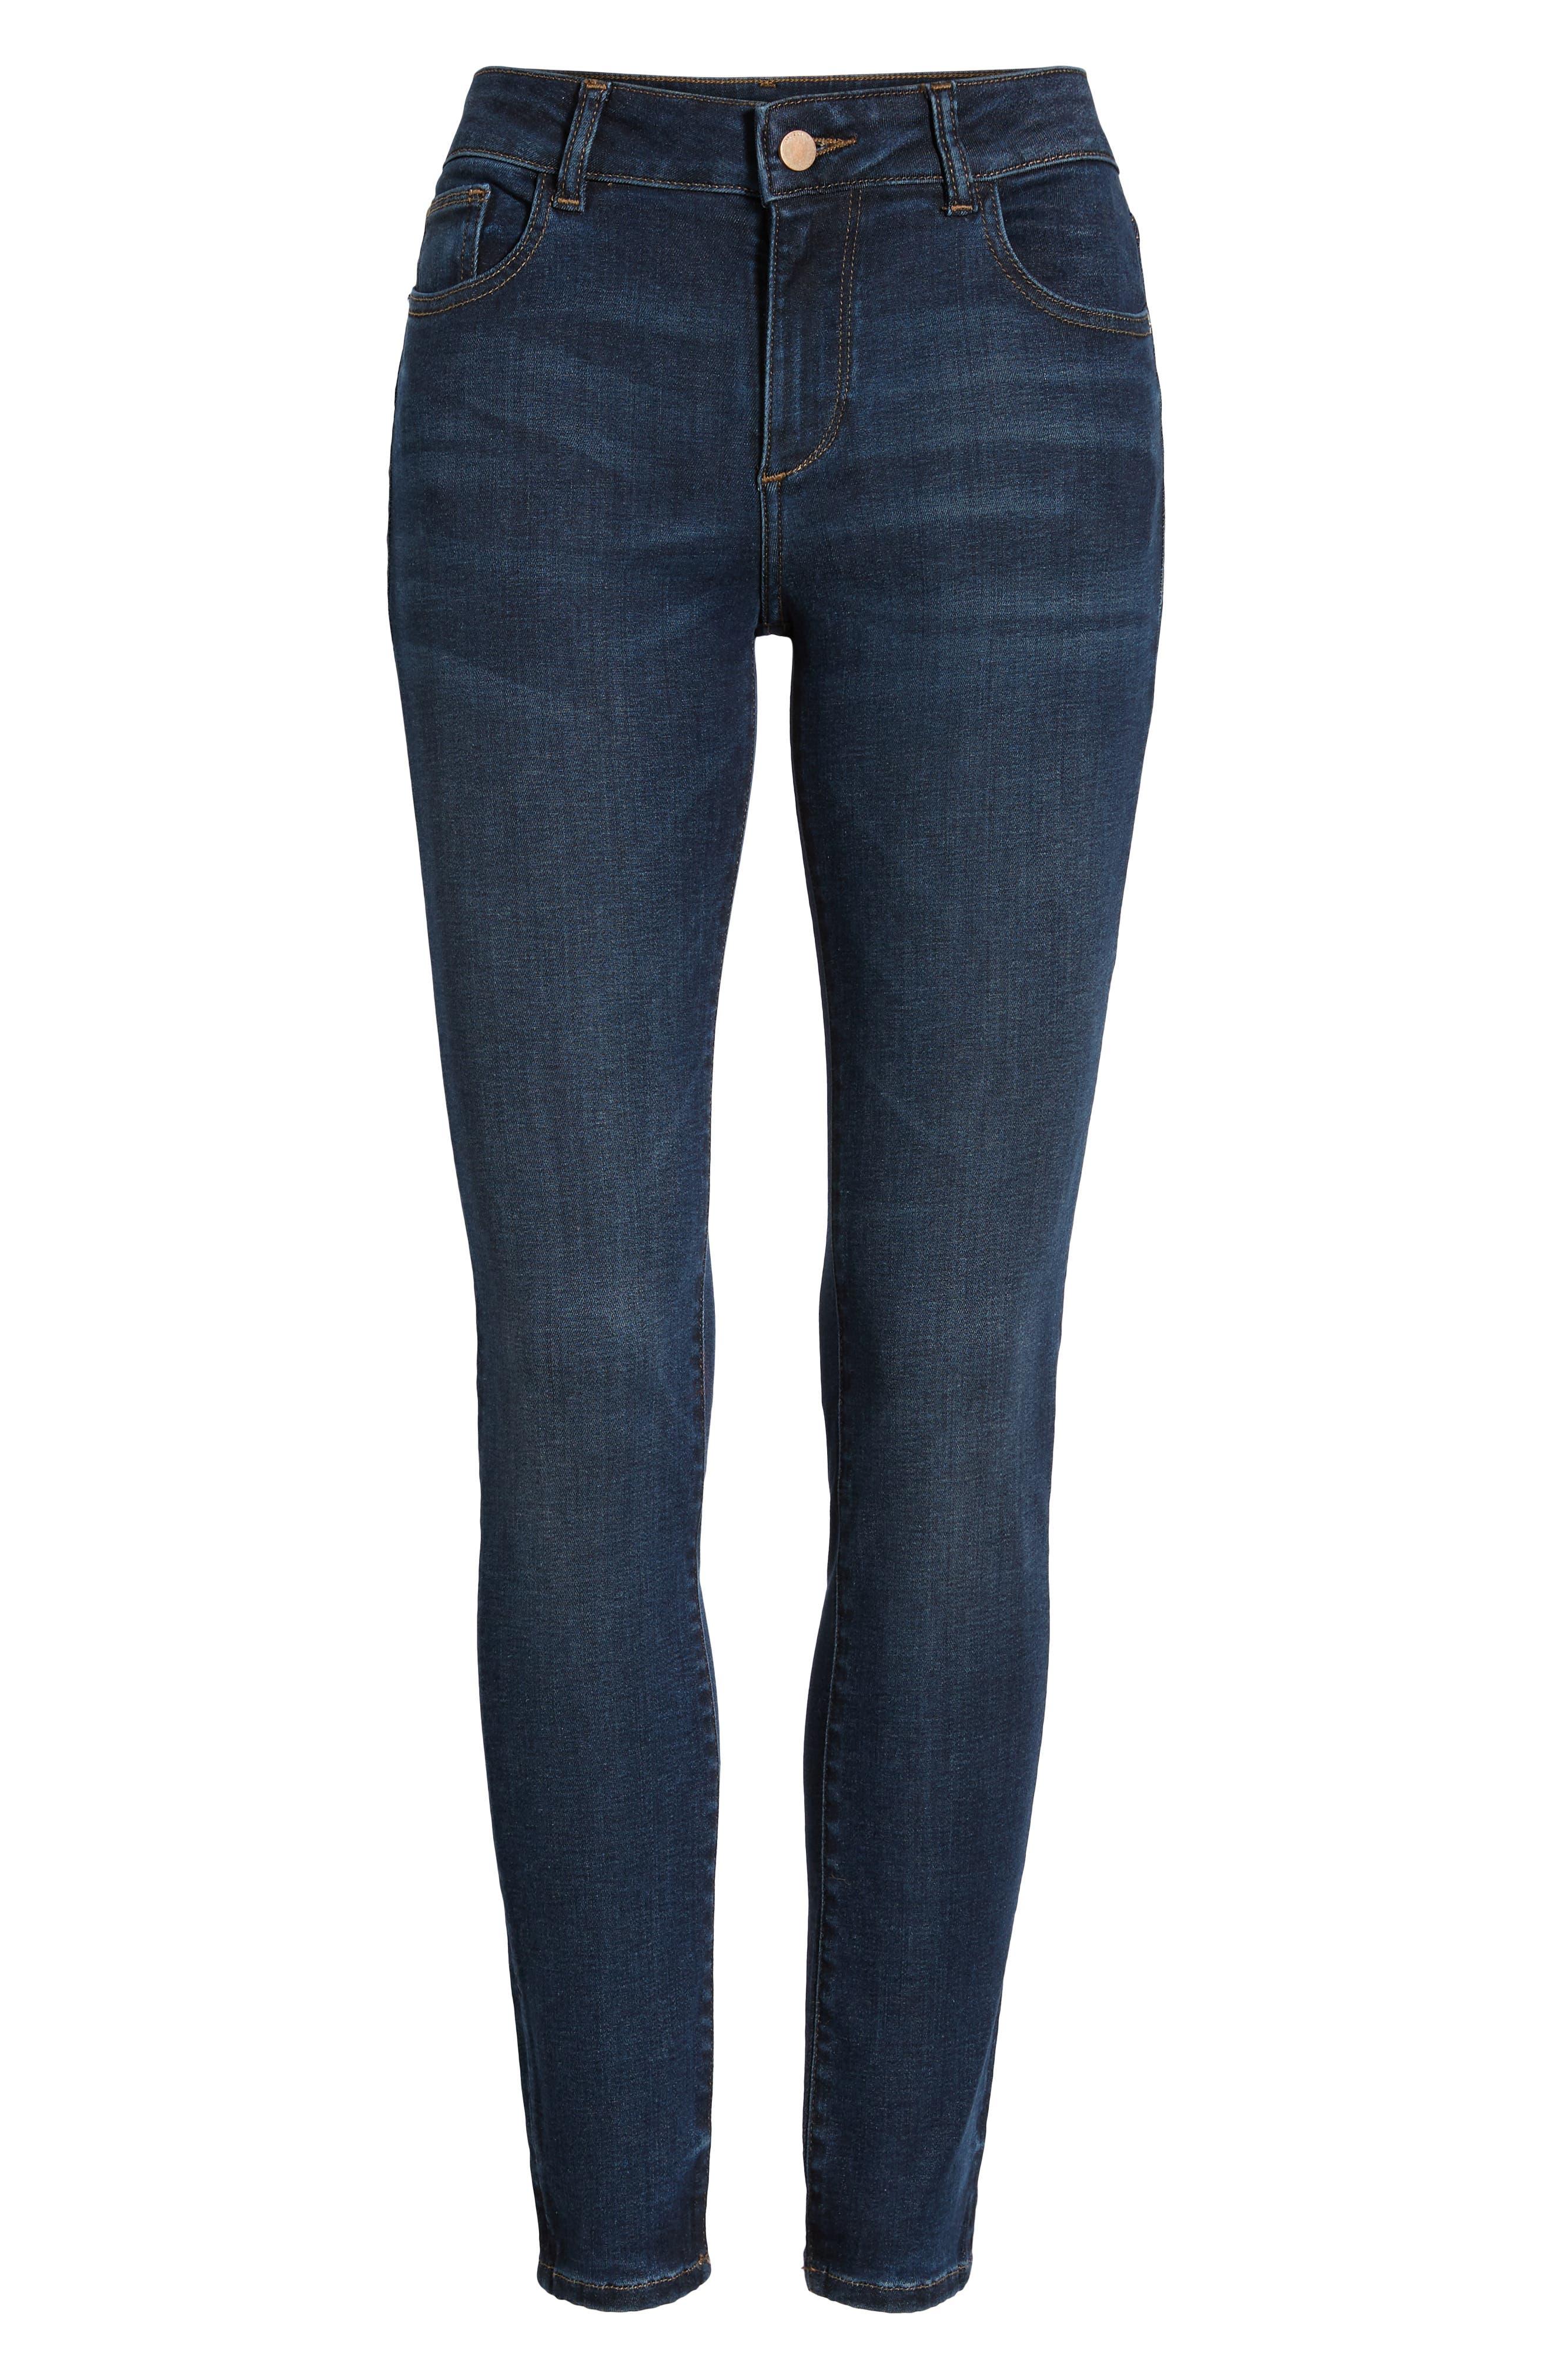 Florence Instasculpt Ankle Skinny Jeans,                             Alternate thumbnail 7, color,                             425